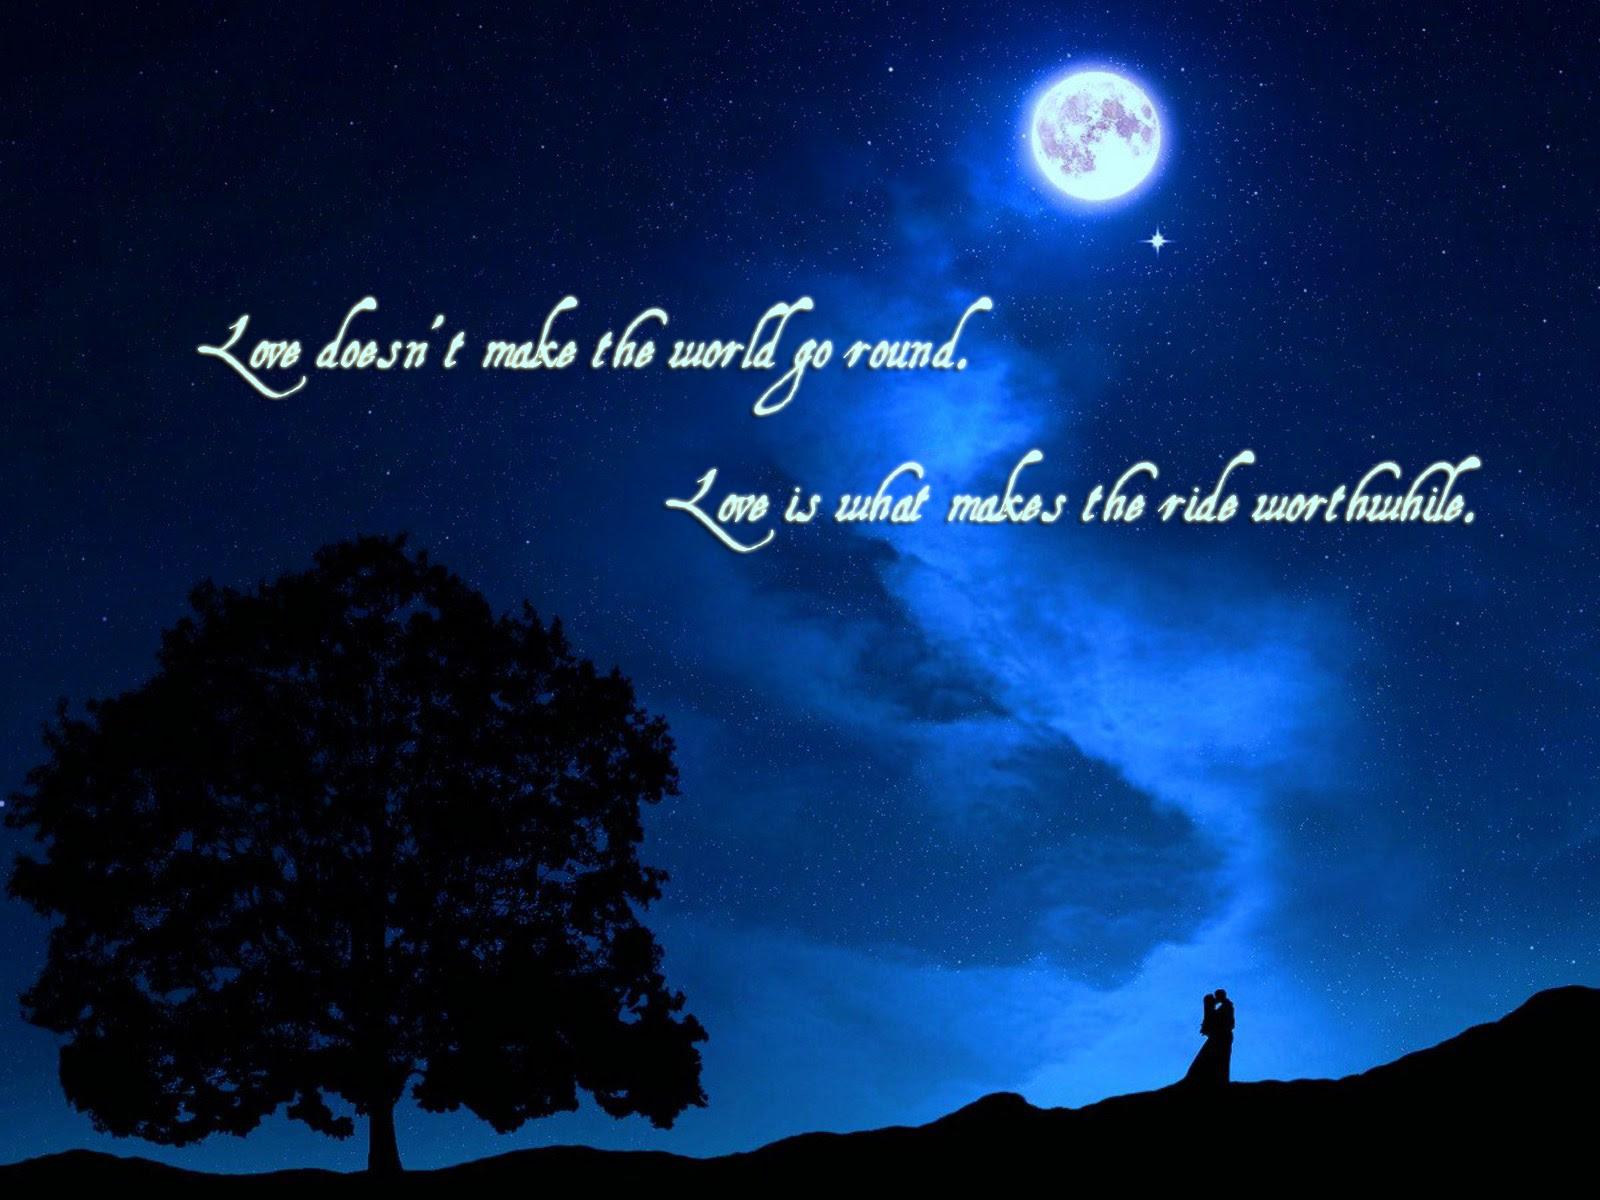 inspirational love quotes Inspirational Love Quote